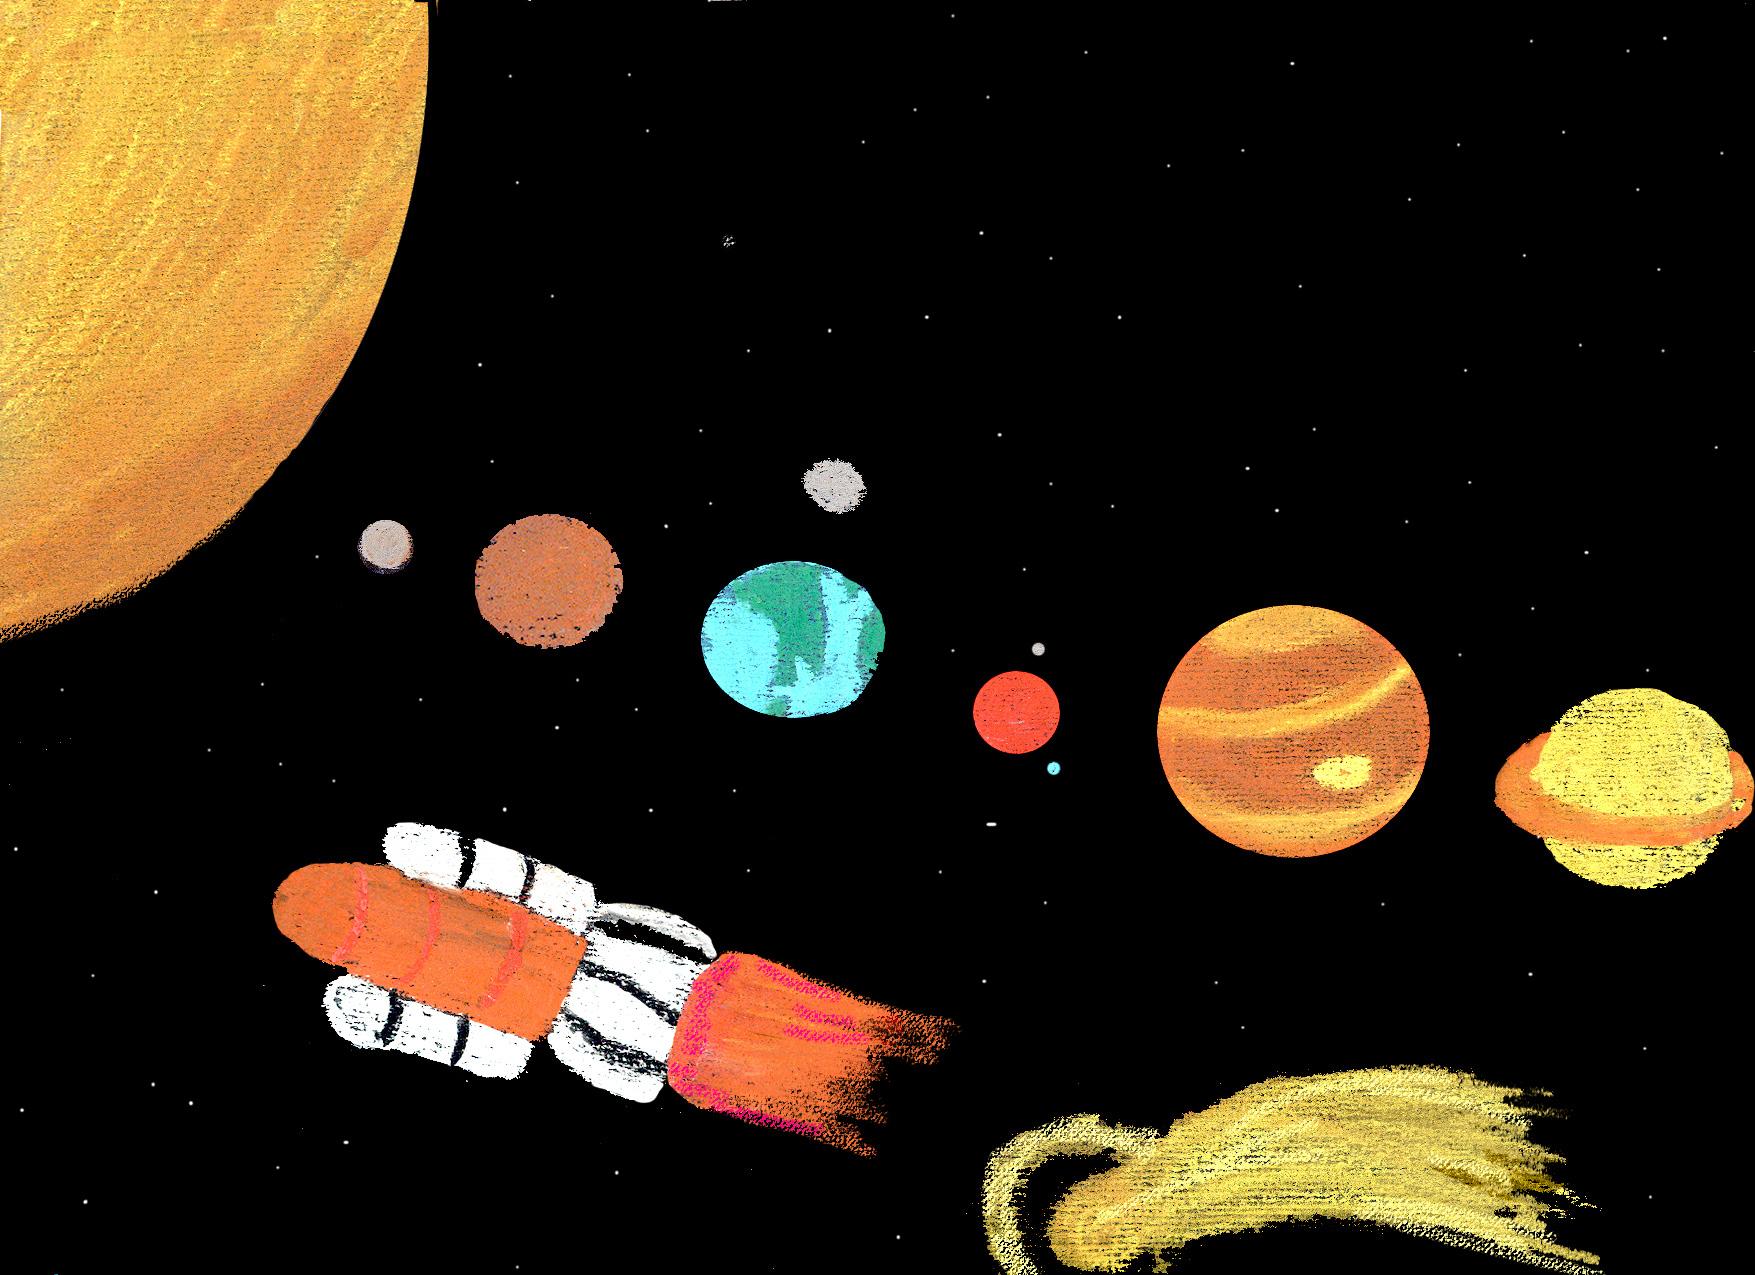 1755x1275 Exploration Of The Solar System Esahubble